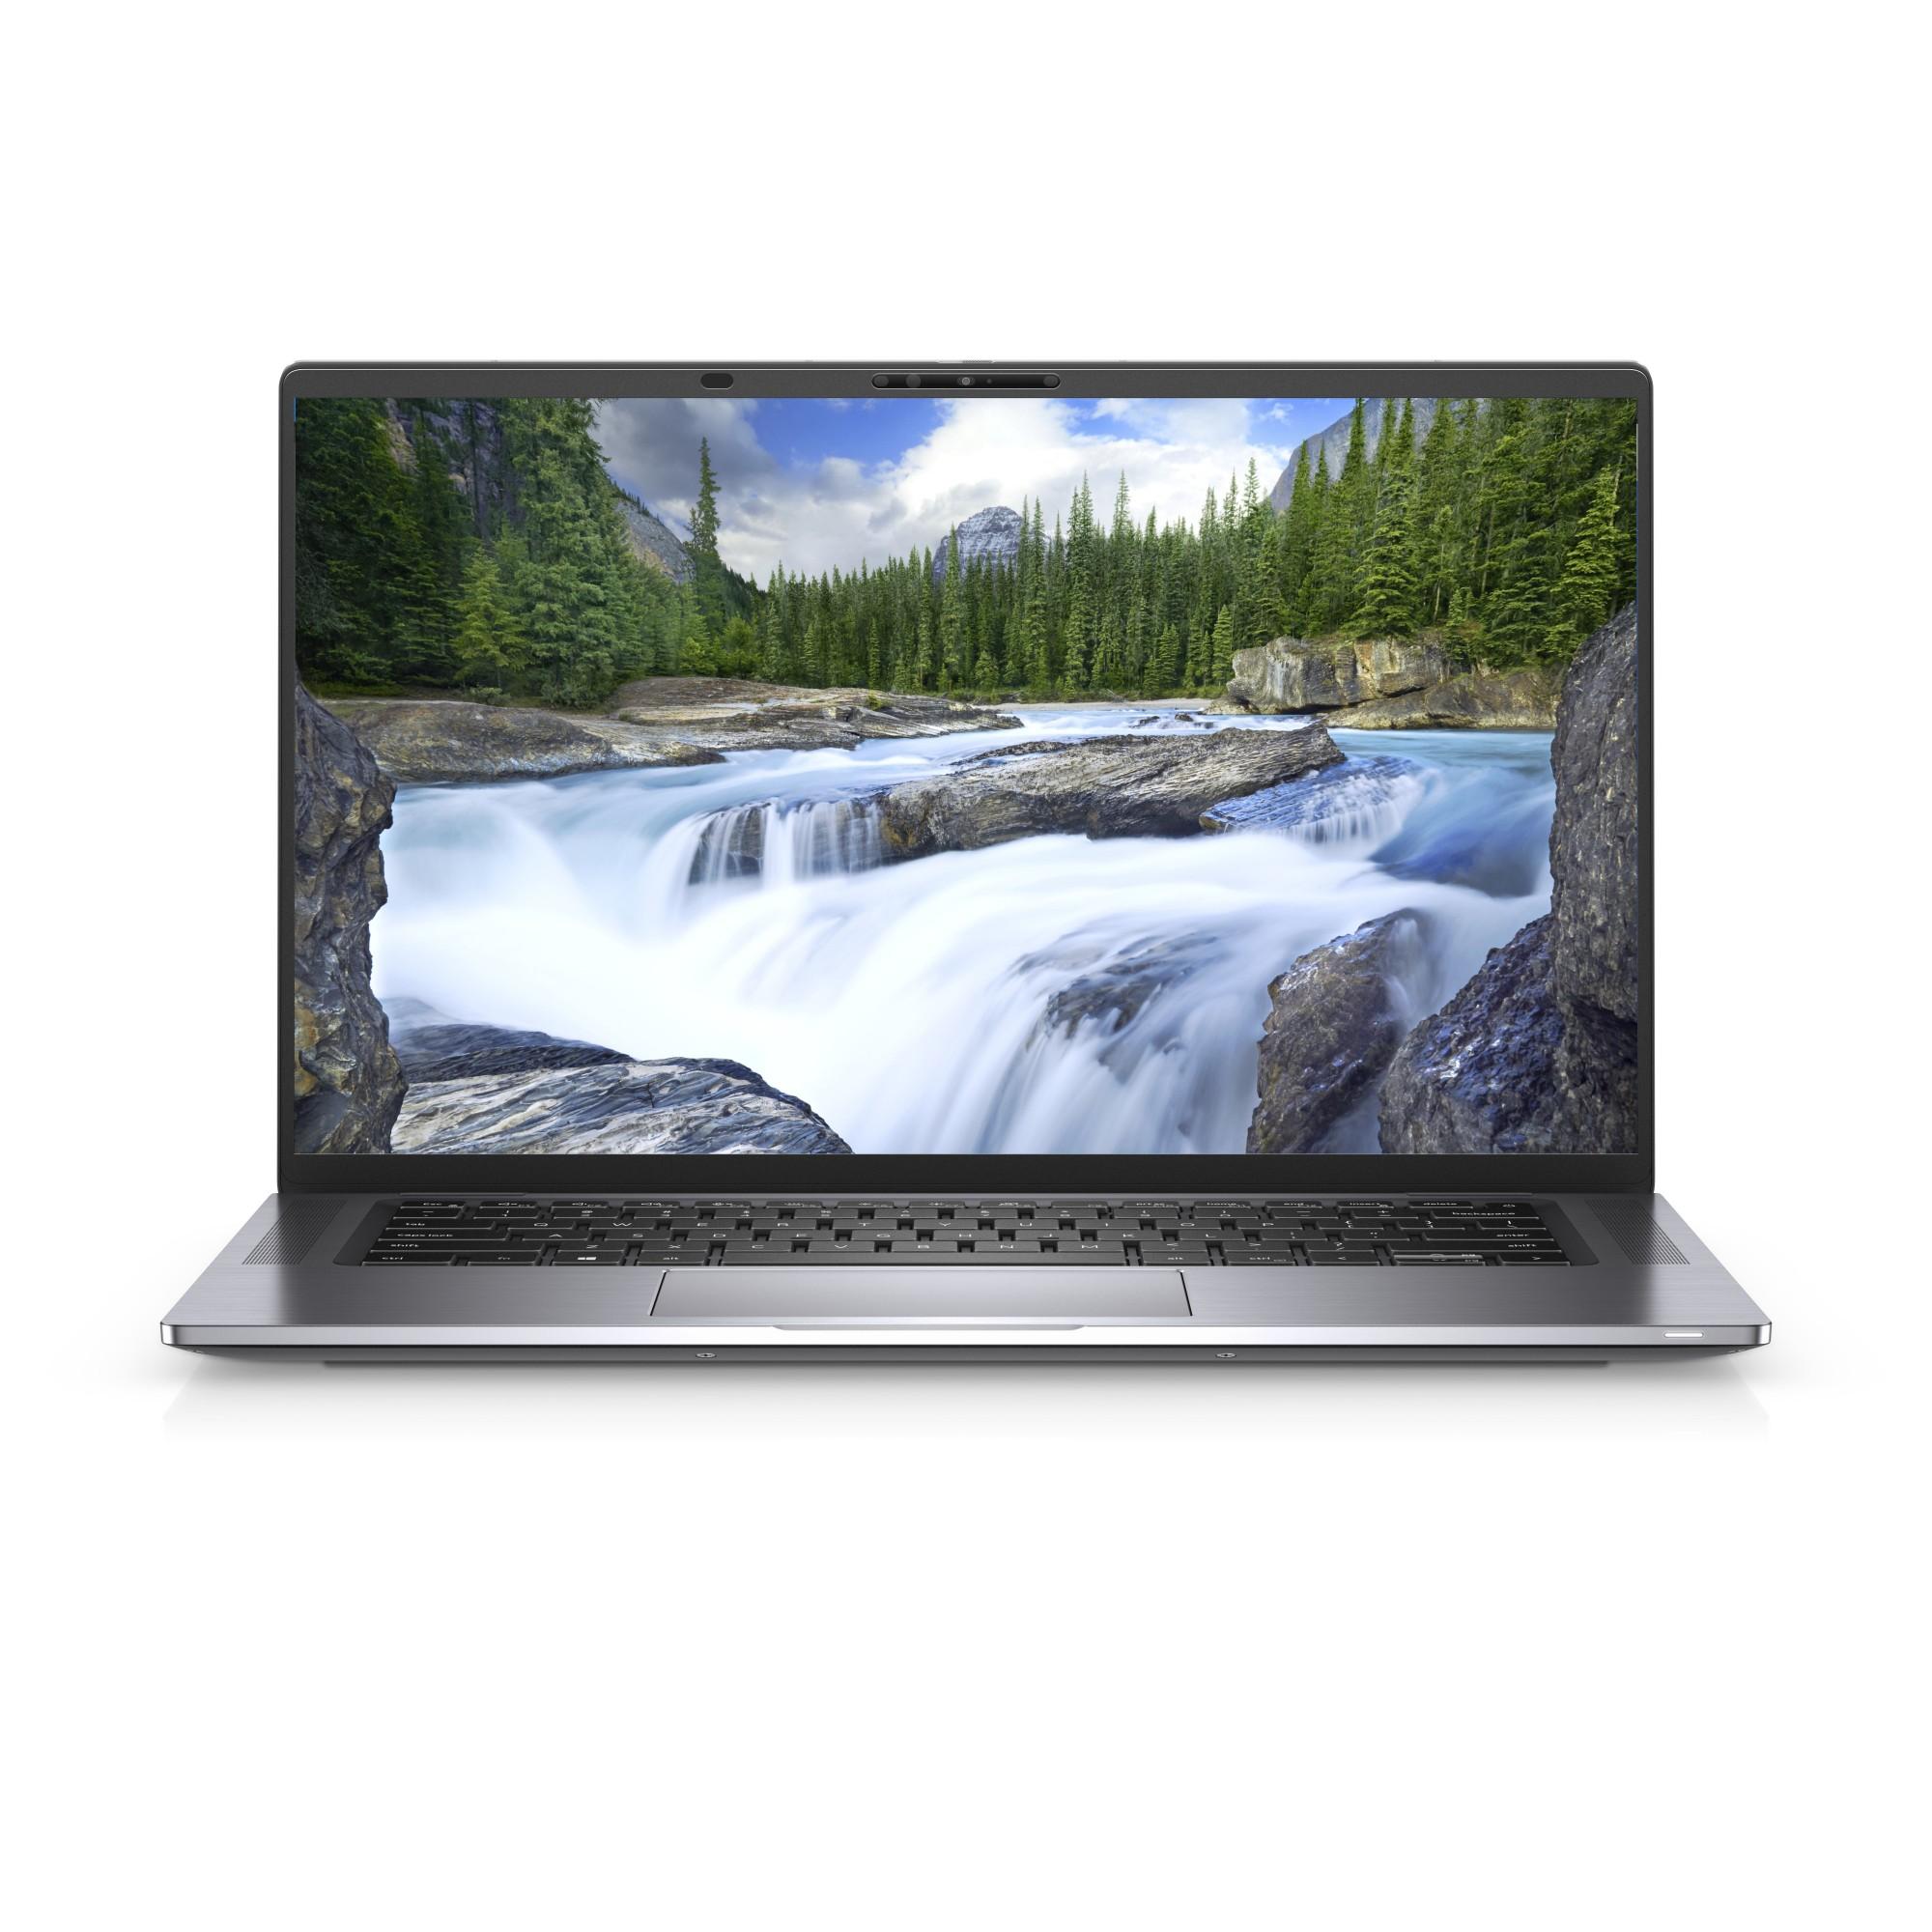 "DELL Latitude 9510 Ultraportátil Negro, Gris 38,1 cm (15"") 1920 x 1080 Pixeles Intel® Core™ i7 de 10ma Generación 16 GB LPDDR3-SDRAM 512 GB SSD Wi-Fi 6 (802.11ax) Windows 10 Pro"